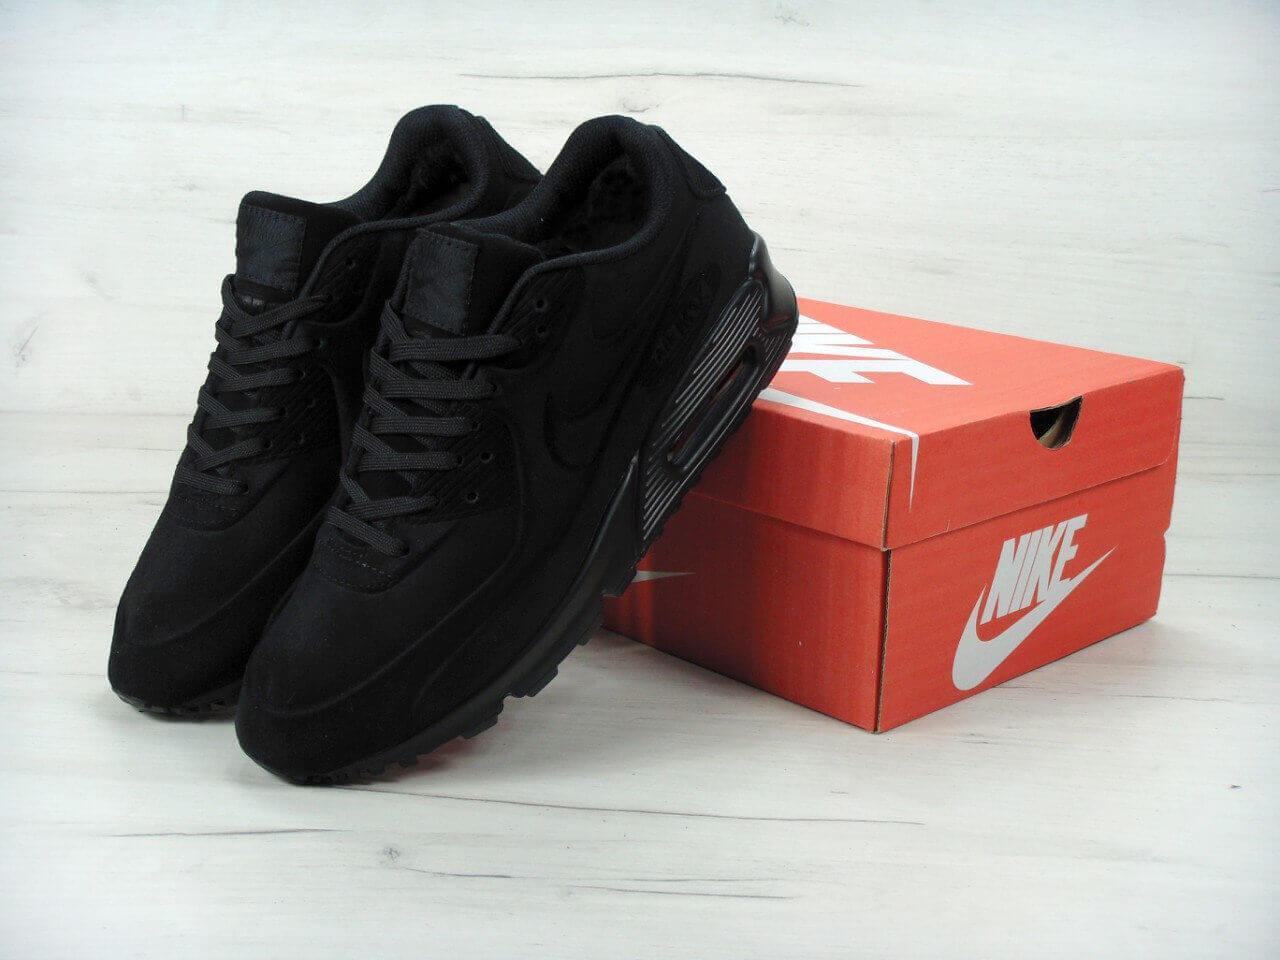 Зимние кроссовки Nike Air Max 90 VT Tweed Winter Black